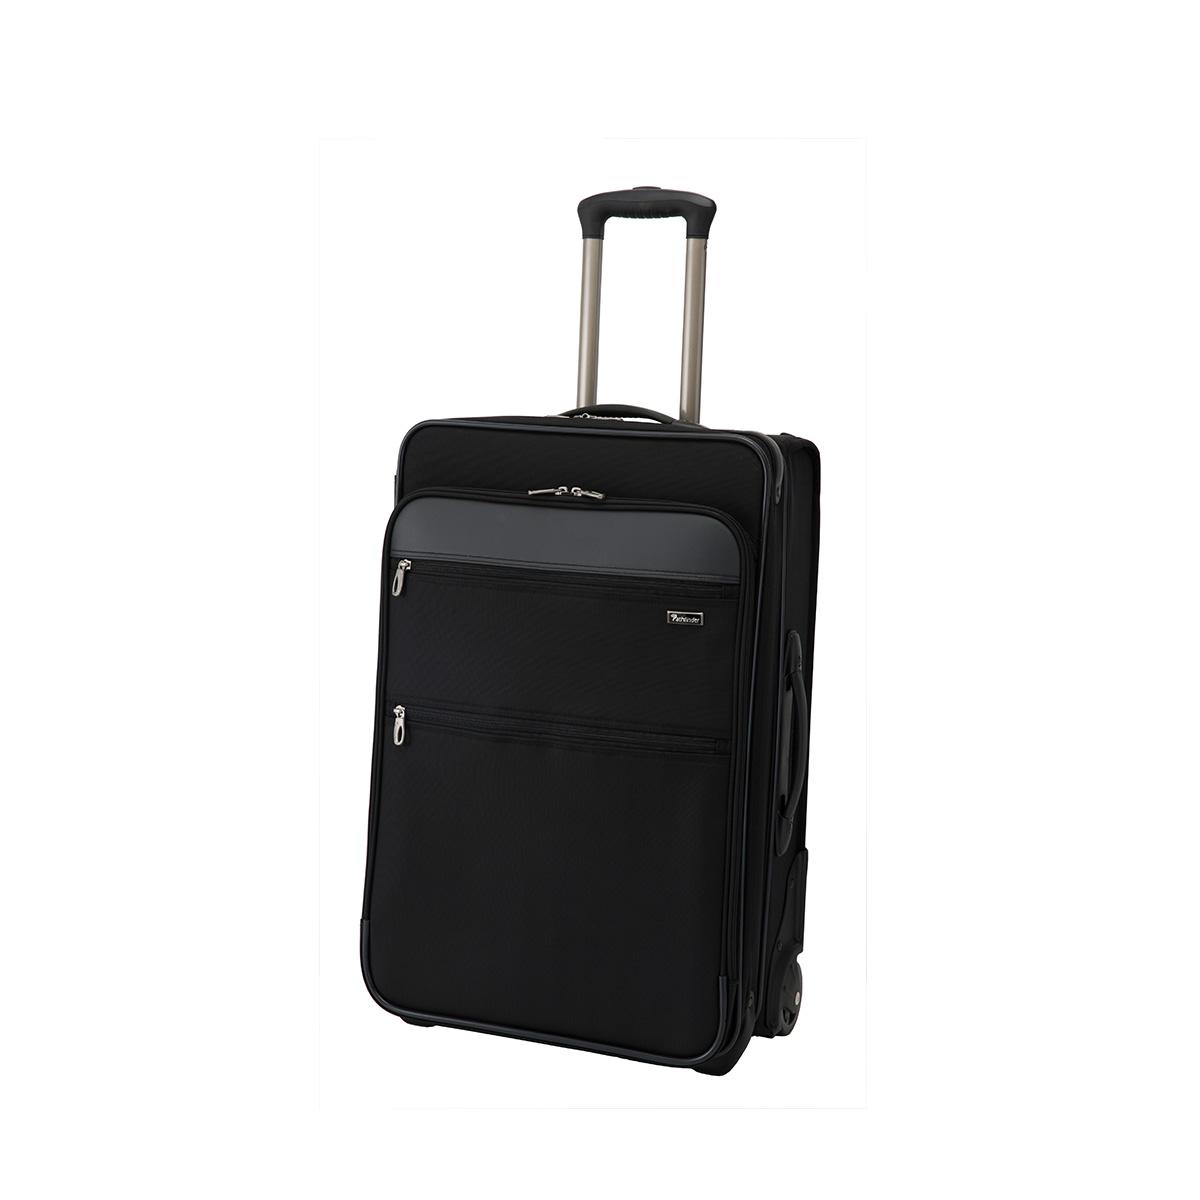 Pathfinder REVOLUTION XT パスファインダー バッグ キャリーケース キャリーバッグ スーツケース 50L-72L メンズ 機内持ち込み ソフト 拡張 ブラック 黒 PF6824DAXB